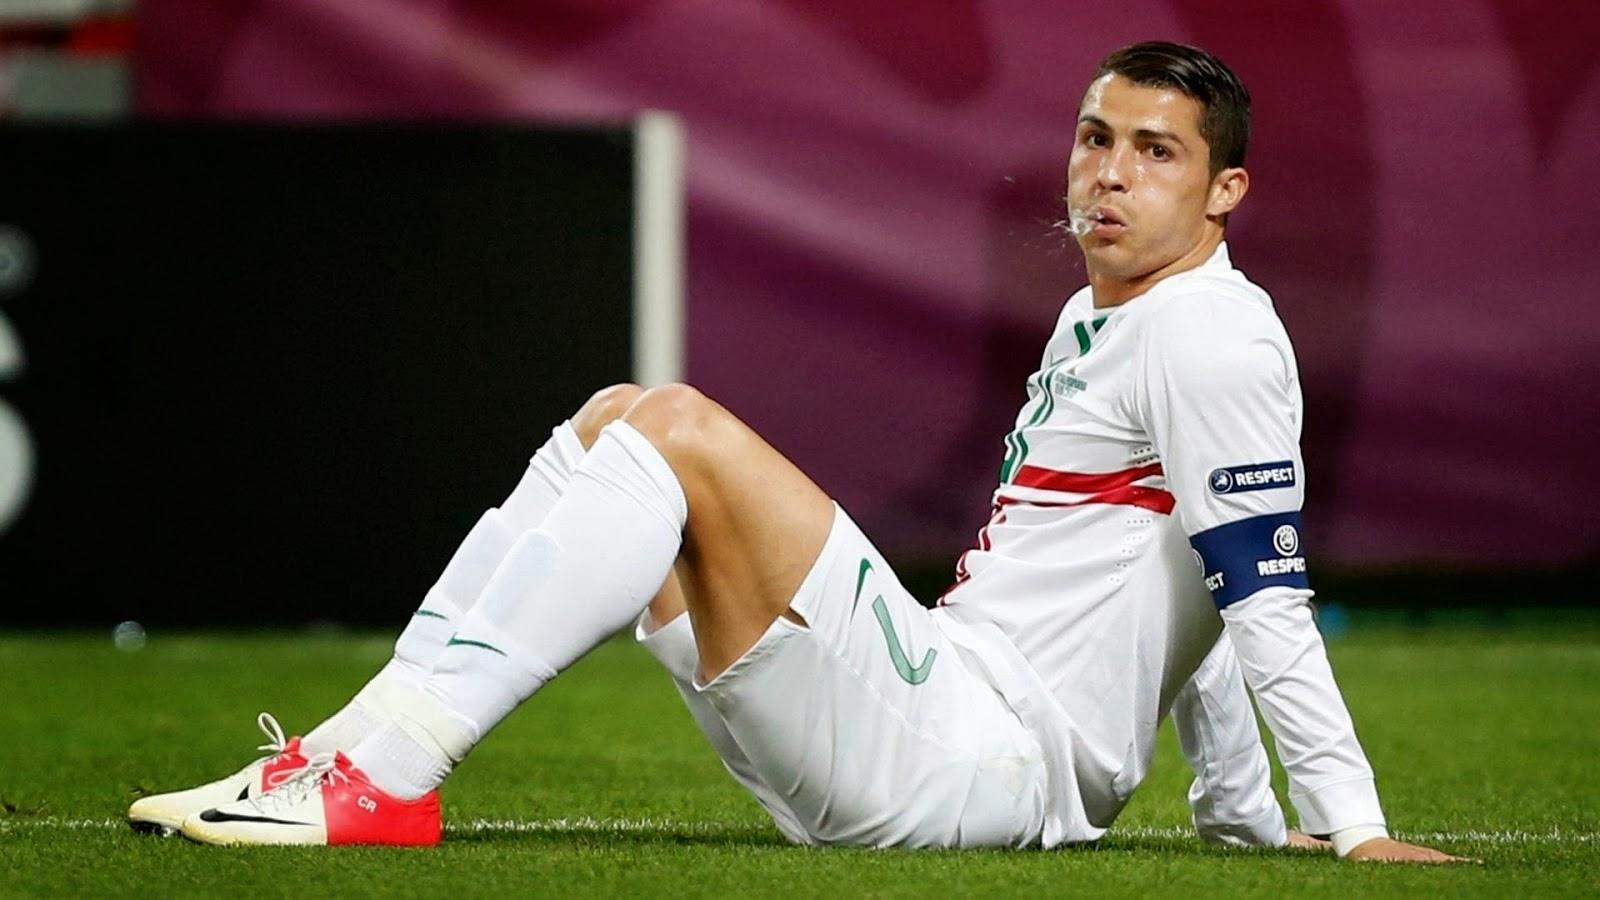 Cristiano-Ronaldo-HD-Images